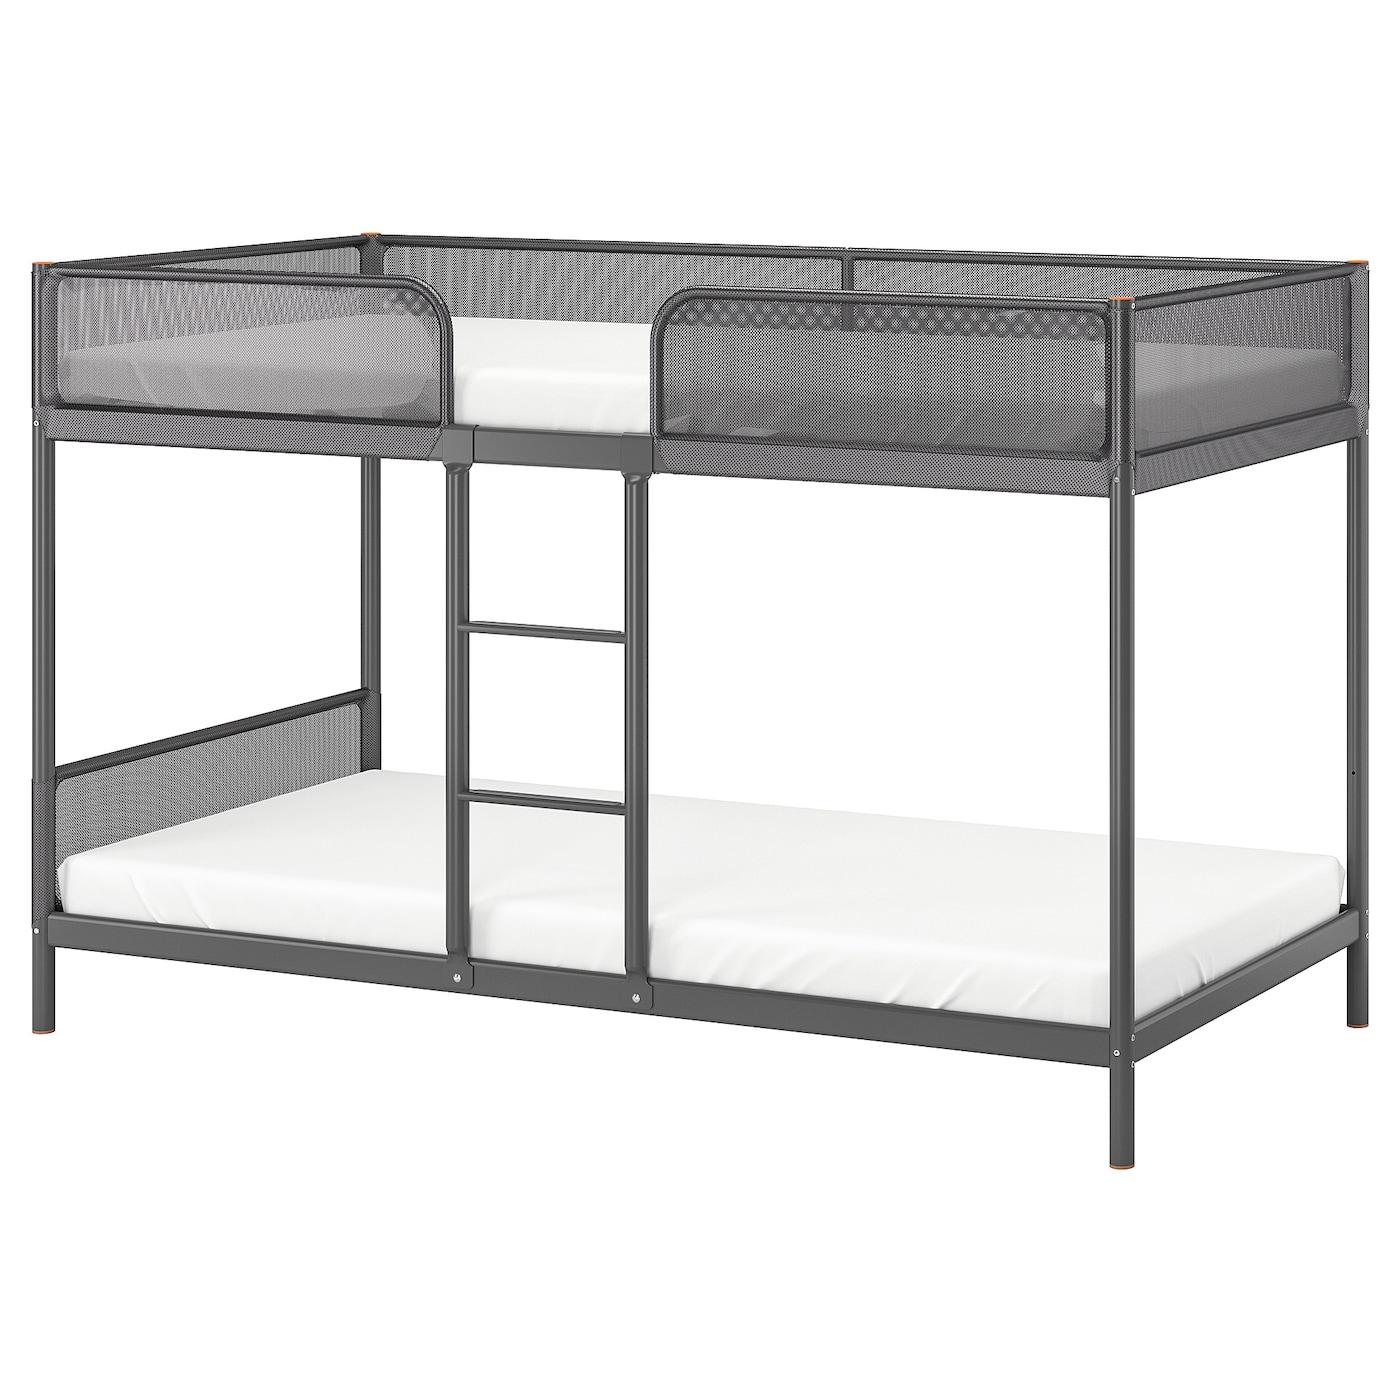 Tuffing Bunk Bed Frame Dark Gray Twin